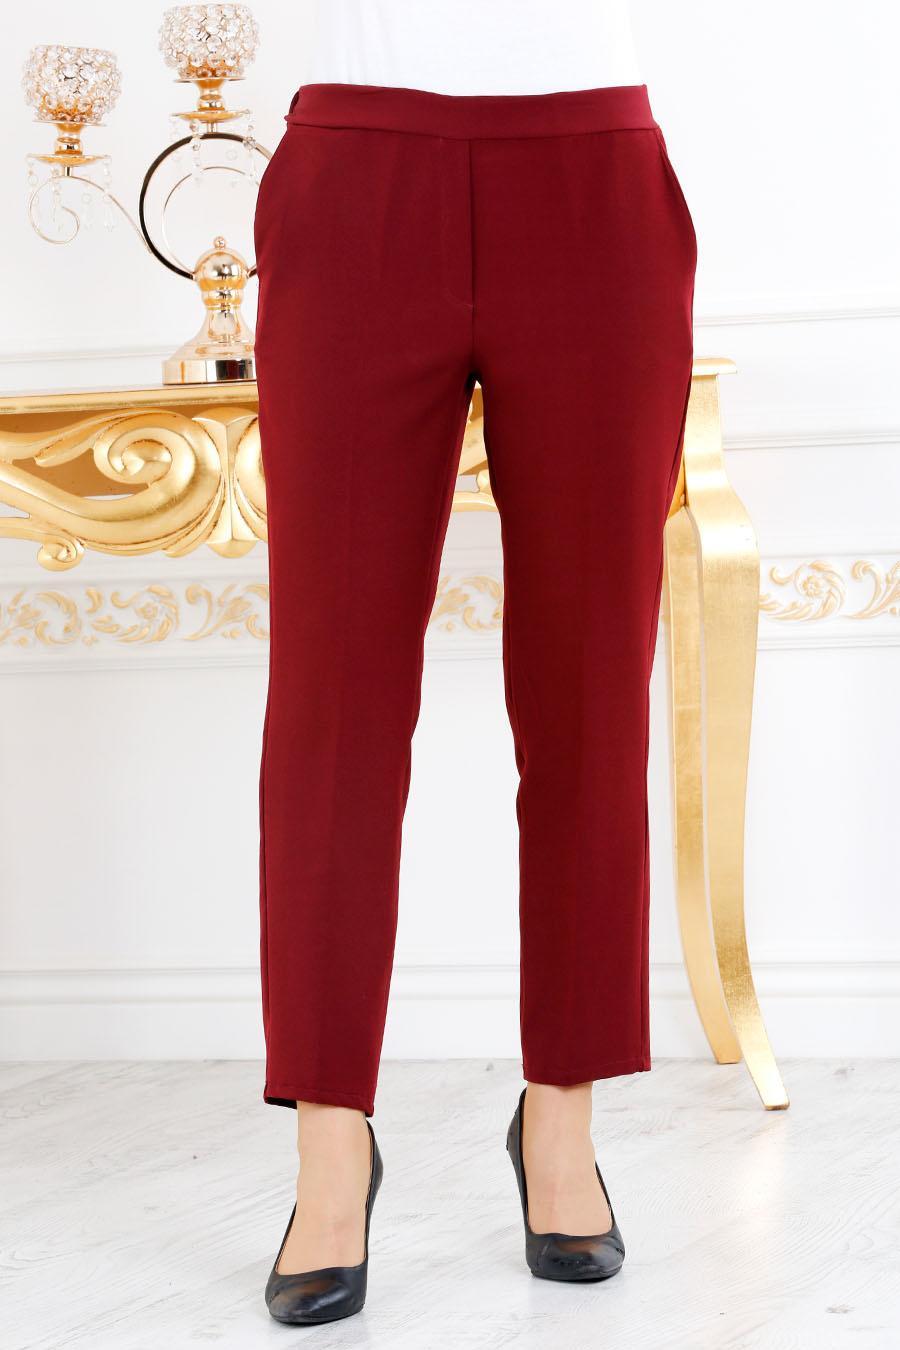 Nayla Collection - Bordo Tesettür Pantolon 20590BR